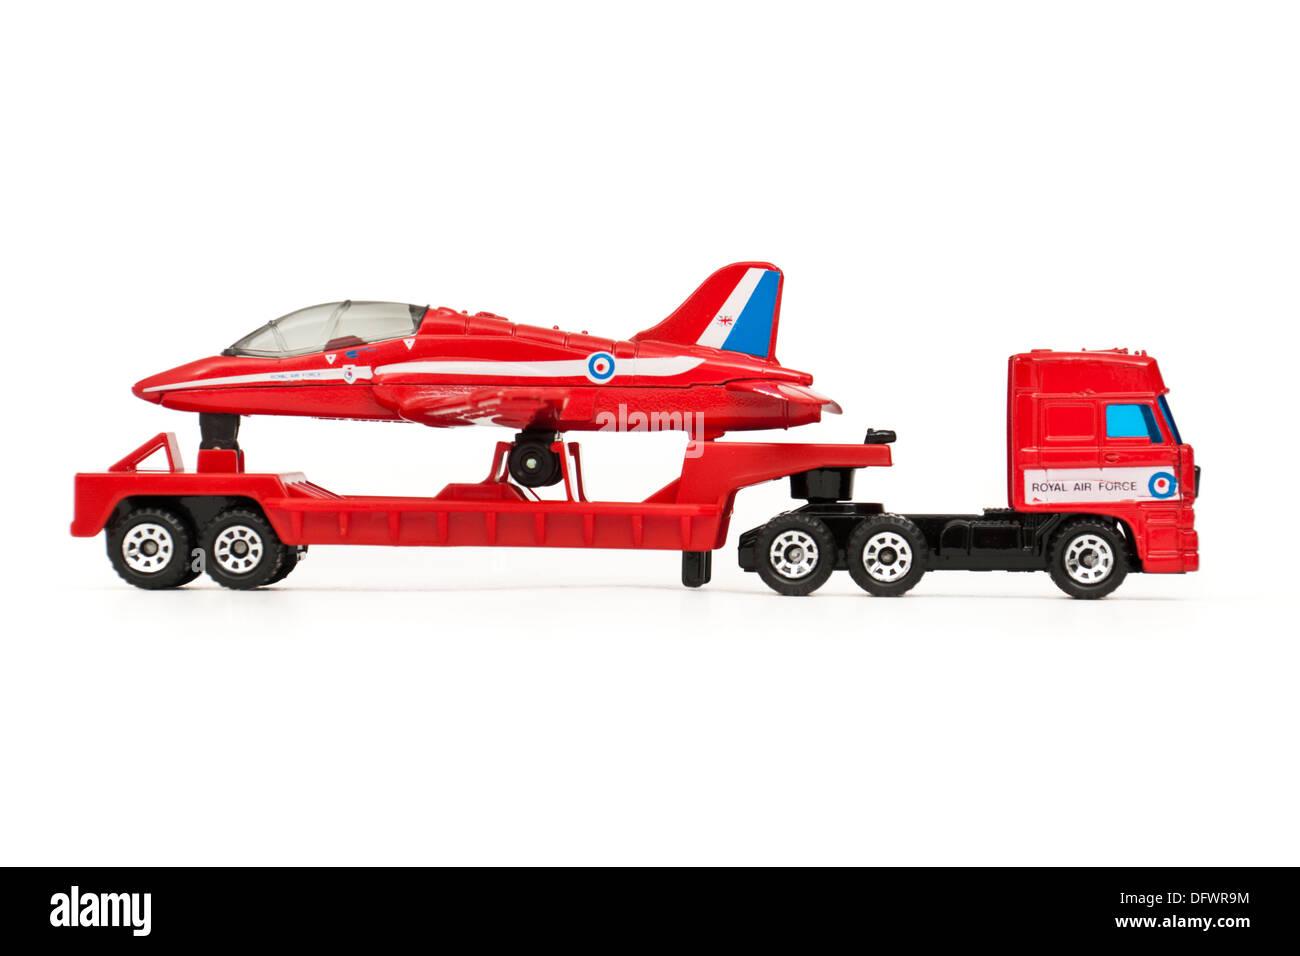 Matchbox (1991) diecast model replica of the BAe Hawk Trainer Mk1 aeroplane on a transporter - Stock Image